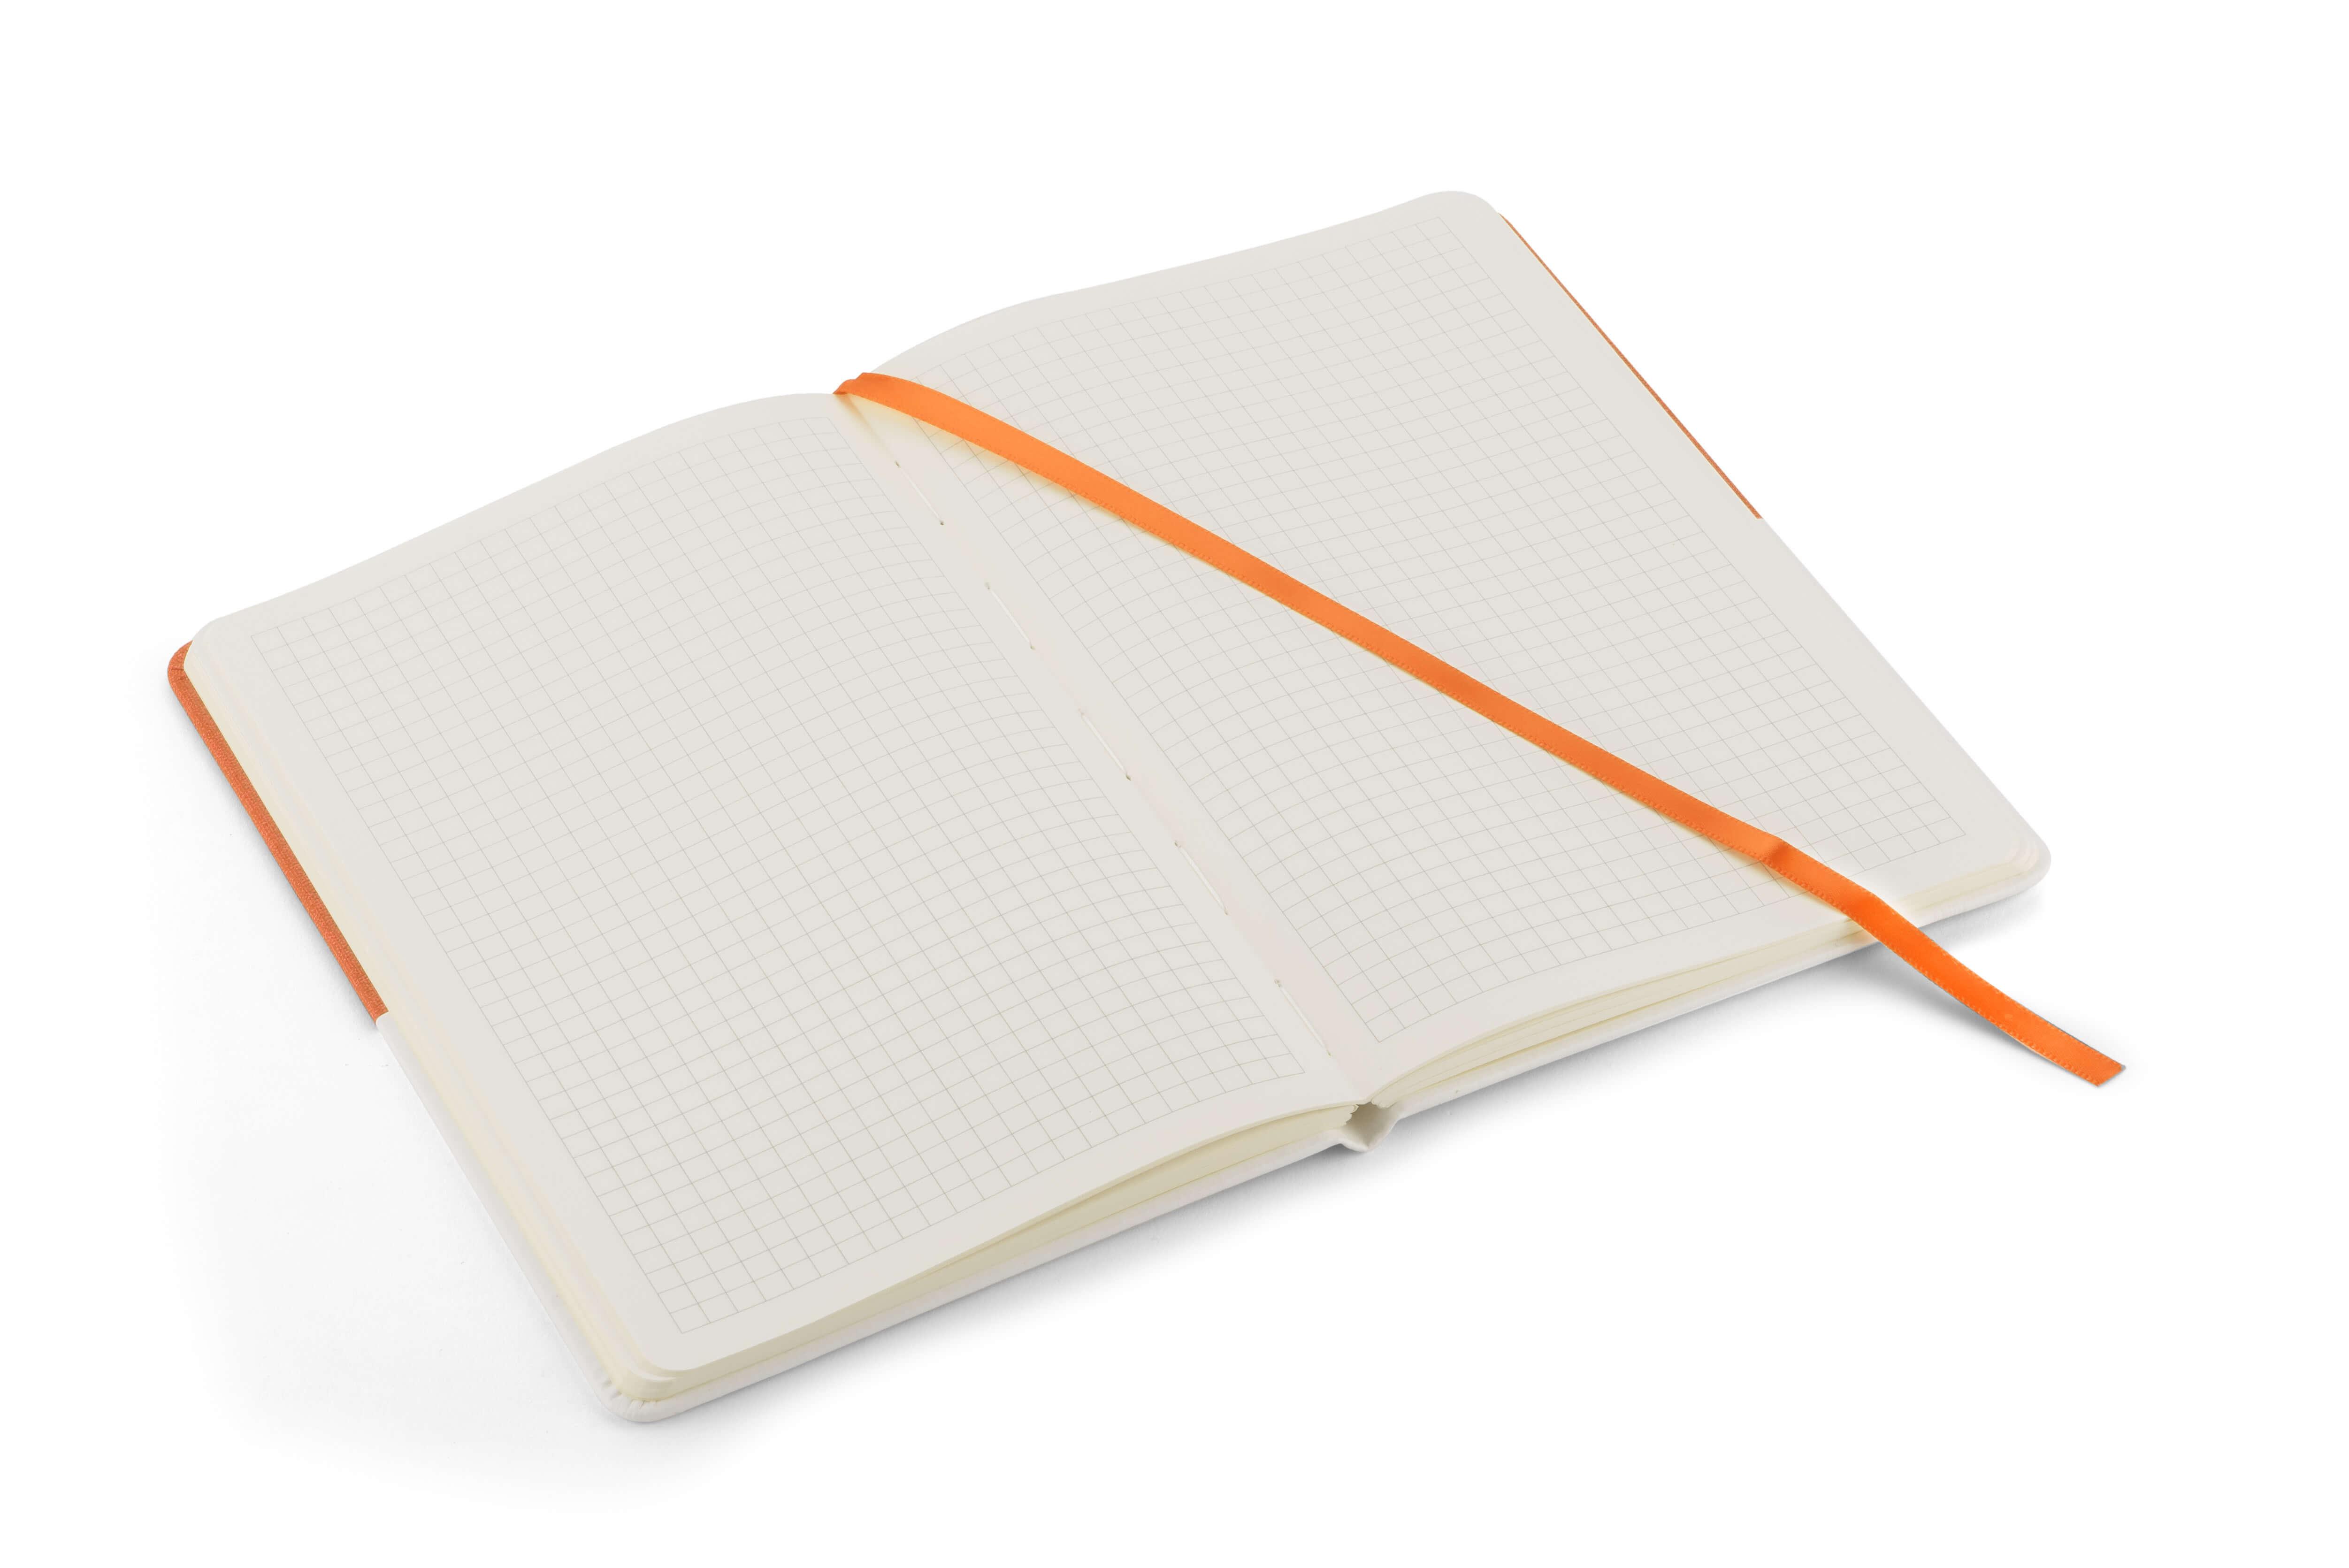 interior notebook twin portocaliu